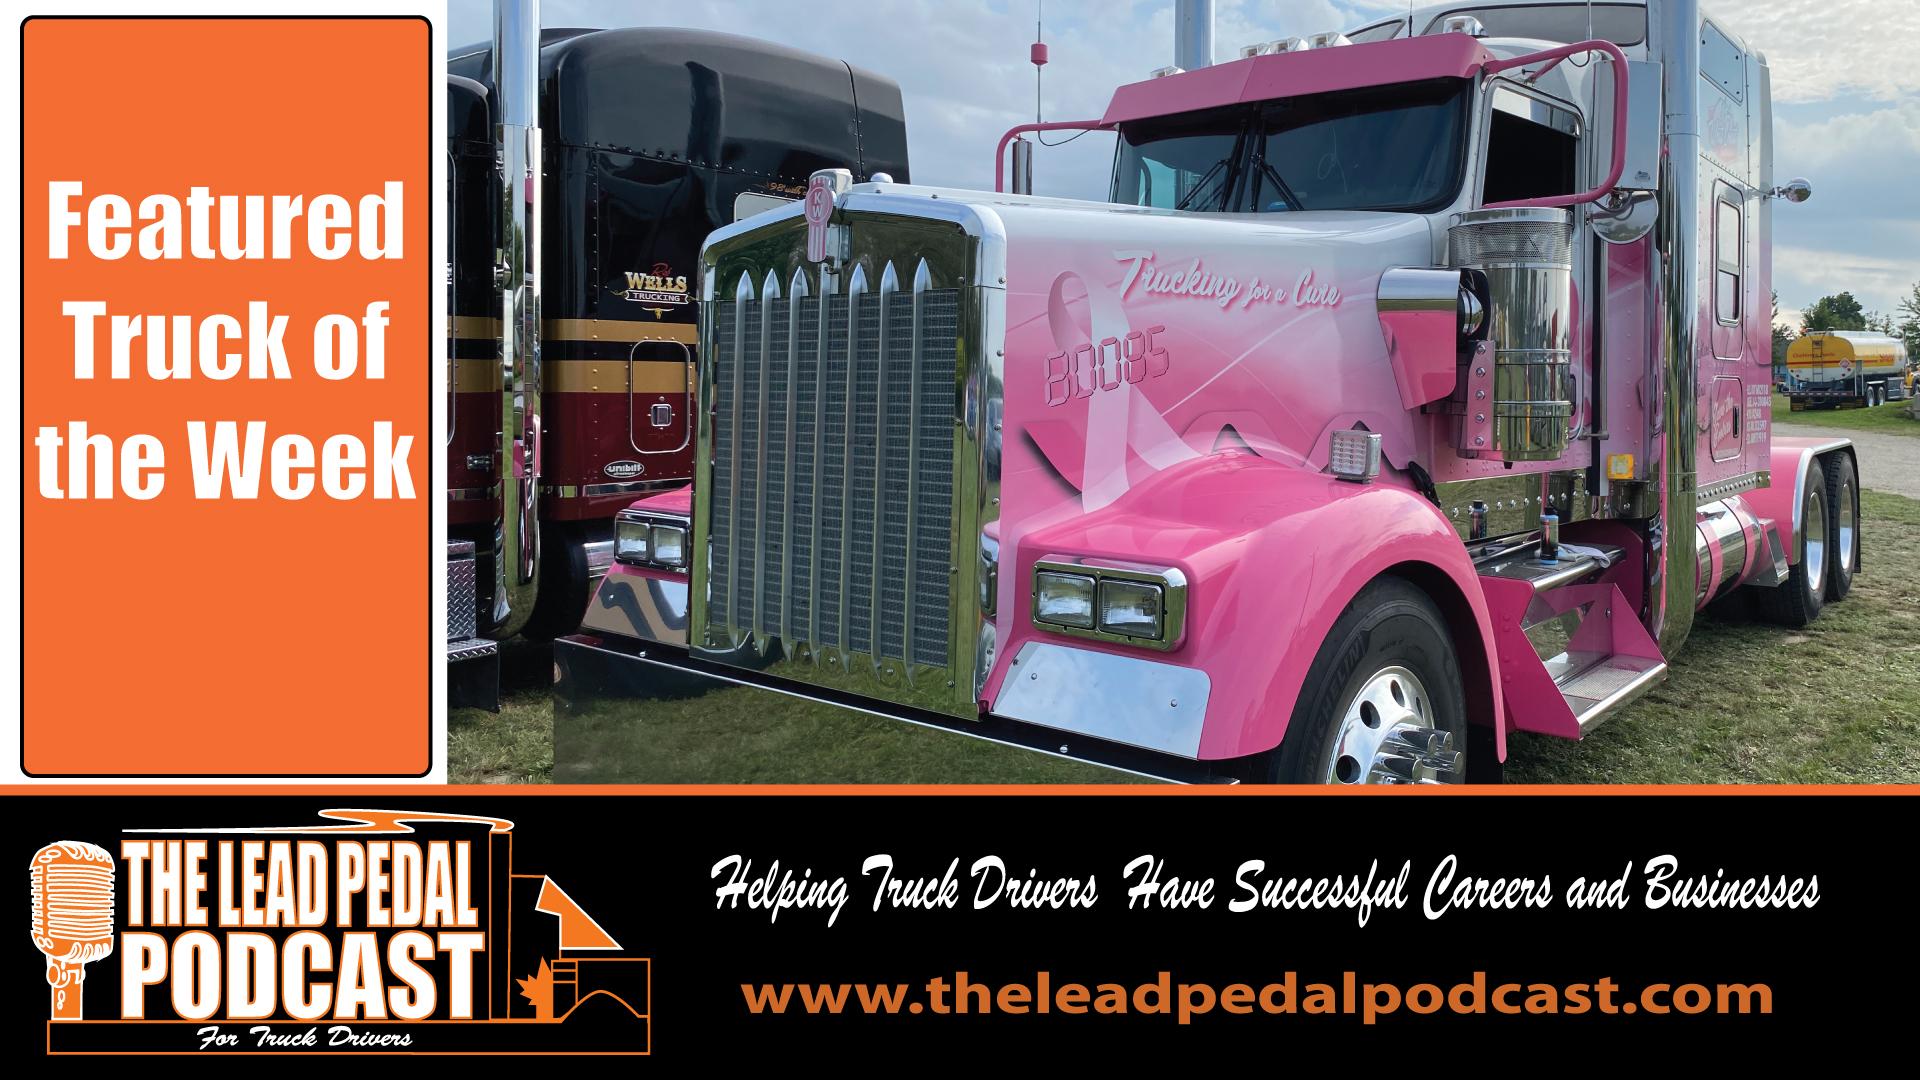 LP697 Featured Truck of the Week - West Coast Transport Kenworth